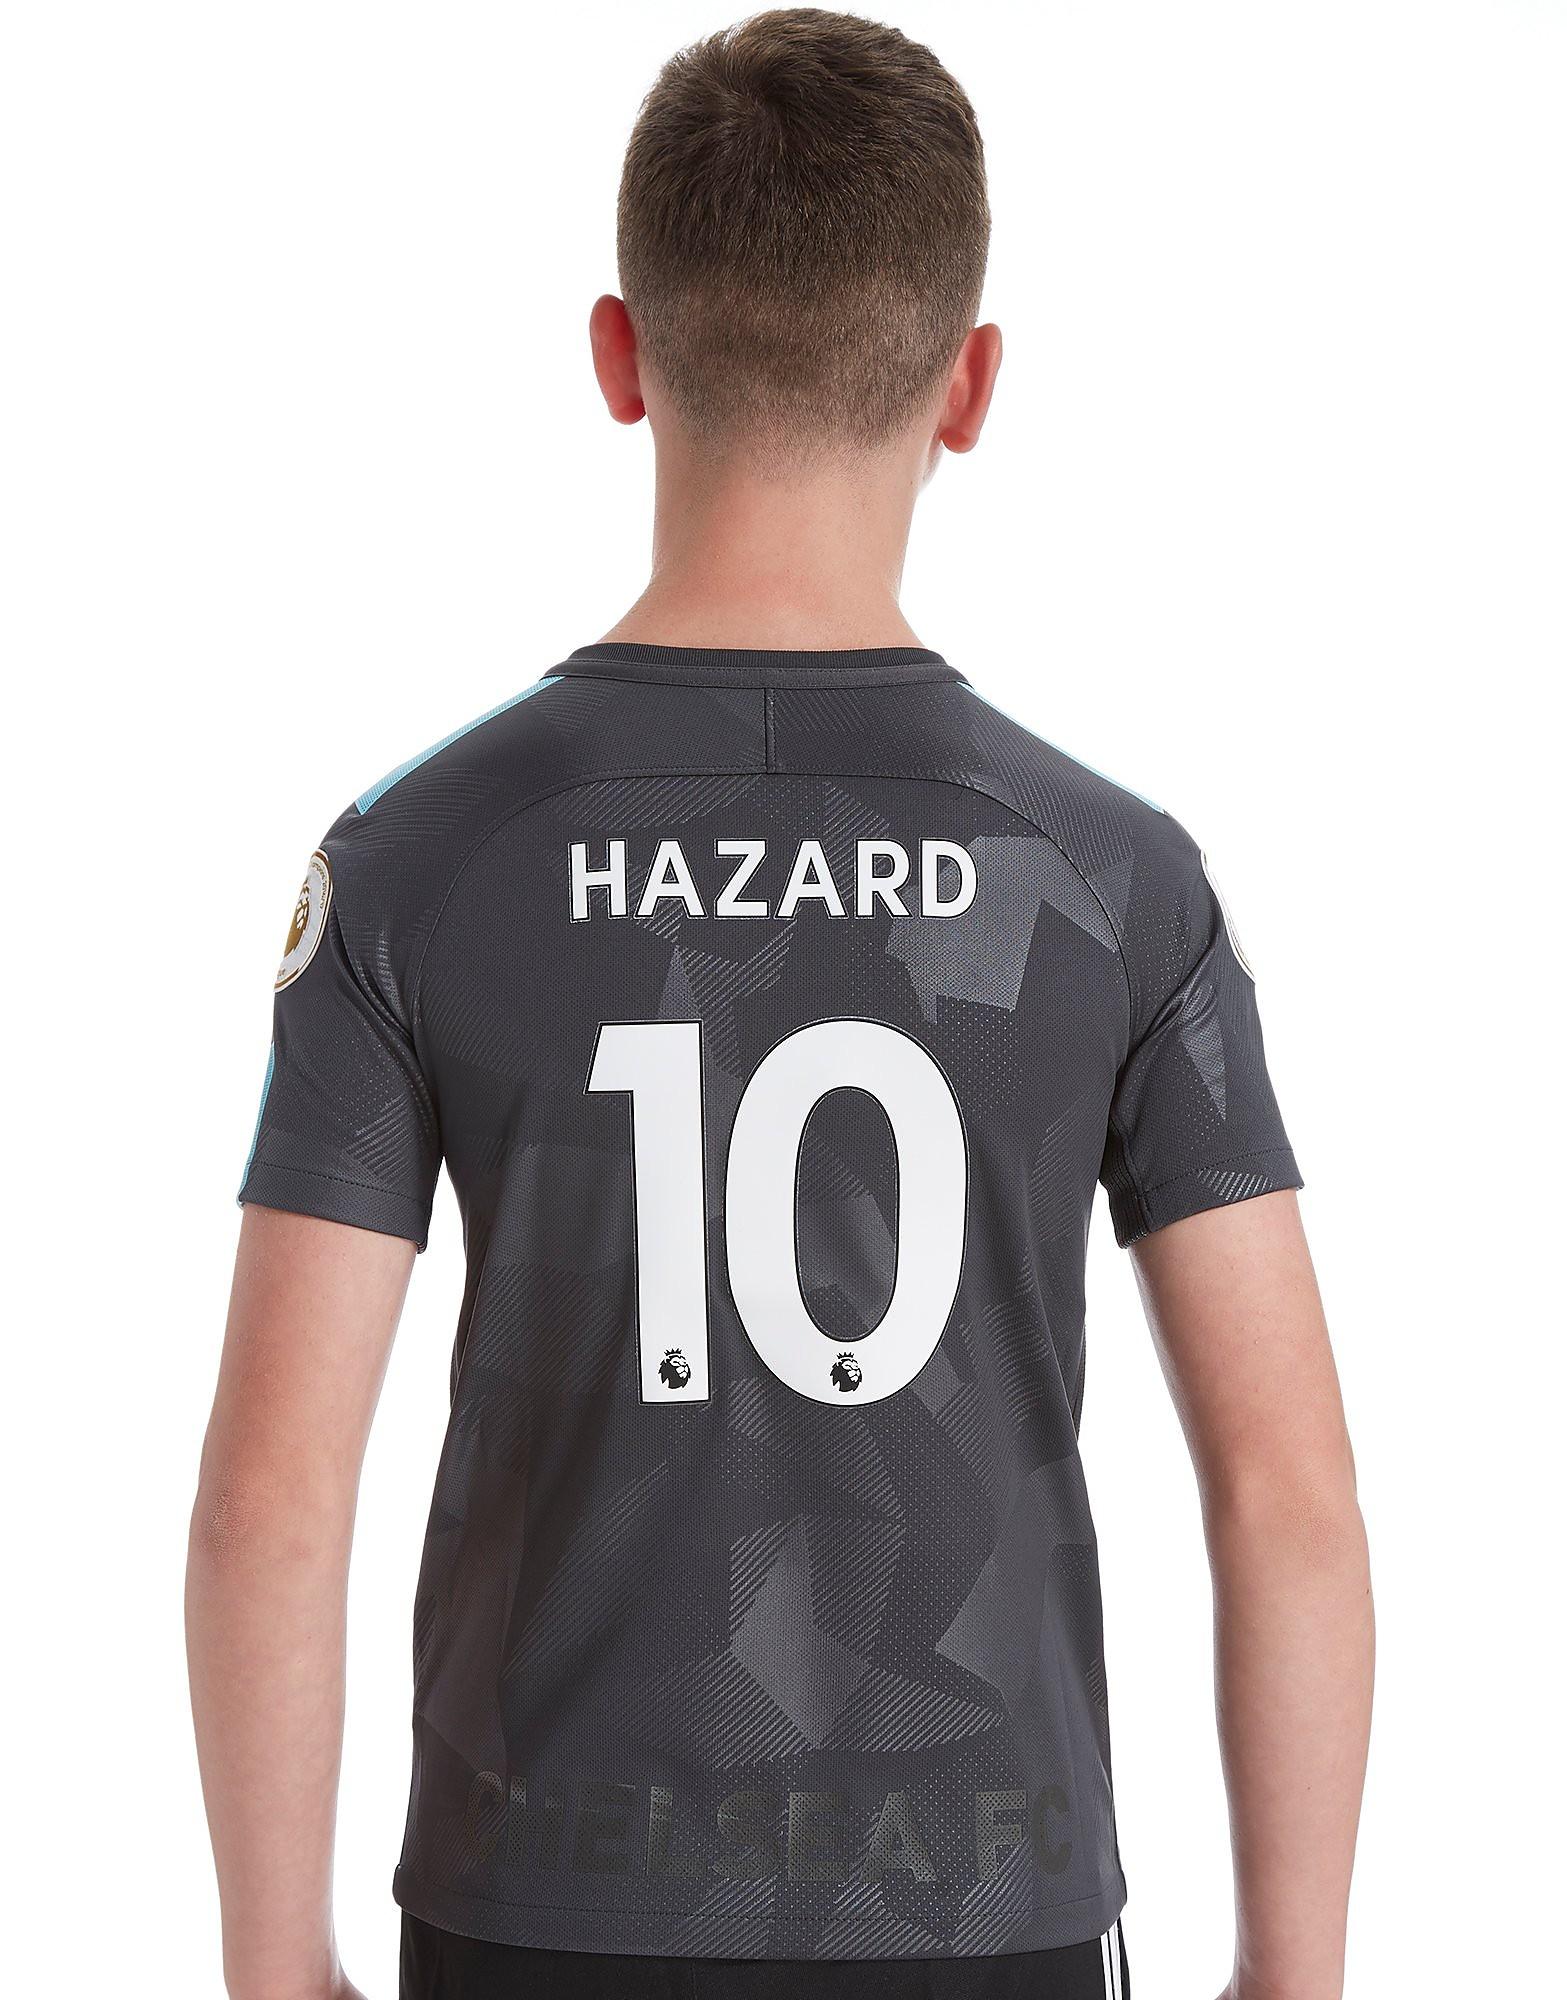 Nike Chelsea FC Third 2017/18 Hazard #10 Shirt Junior